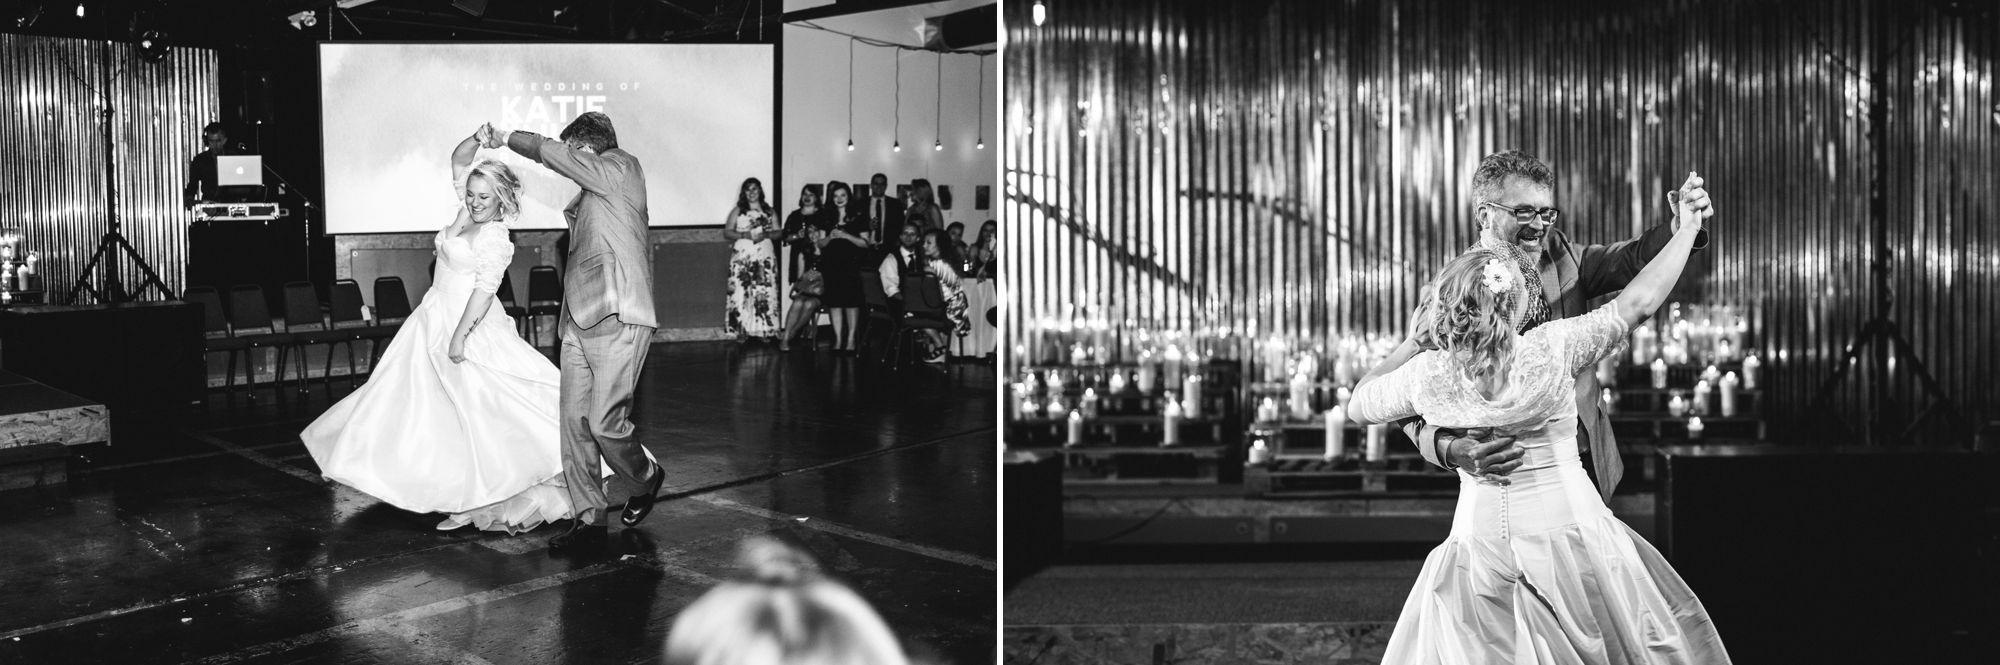 uptown-charlotte-warhouse-wedding 107